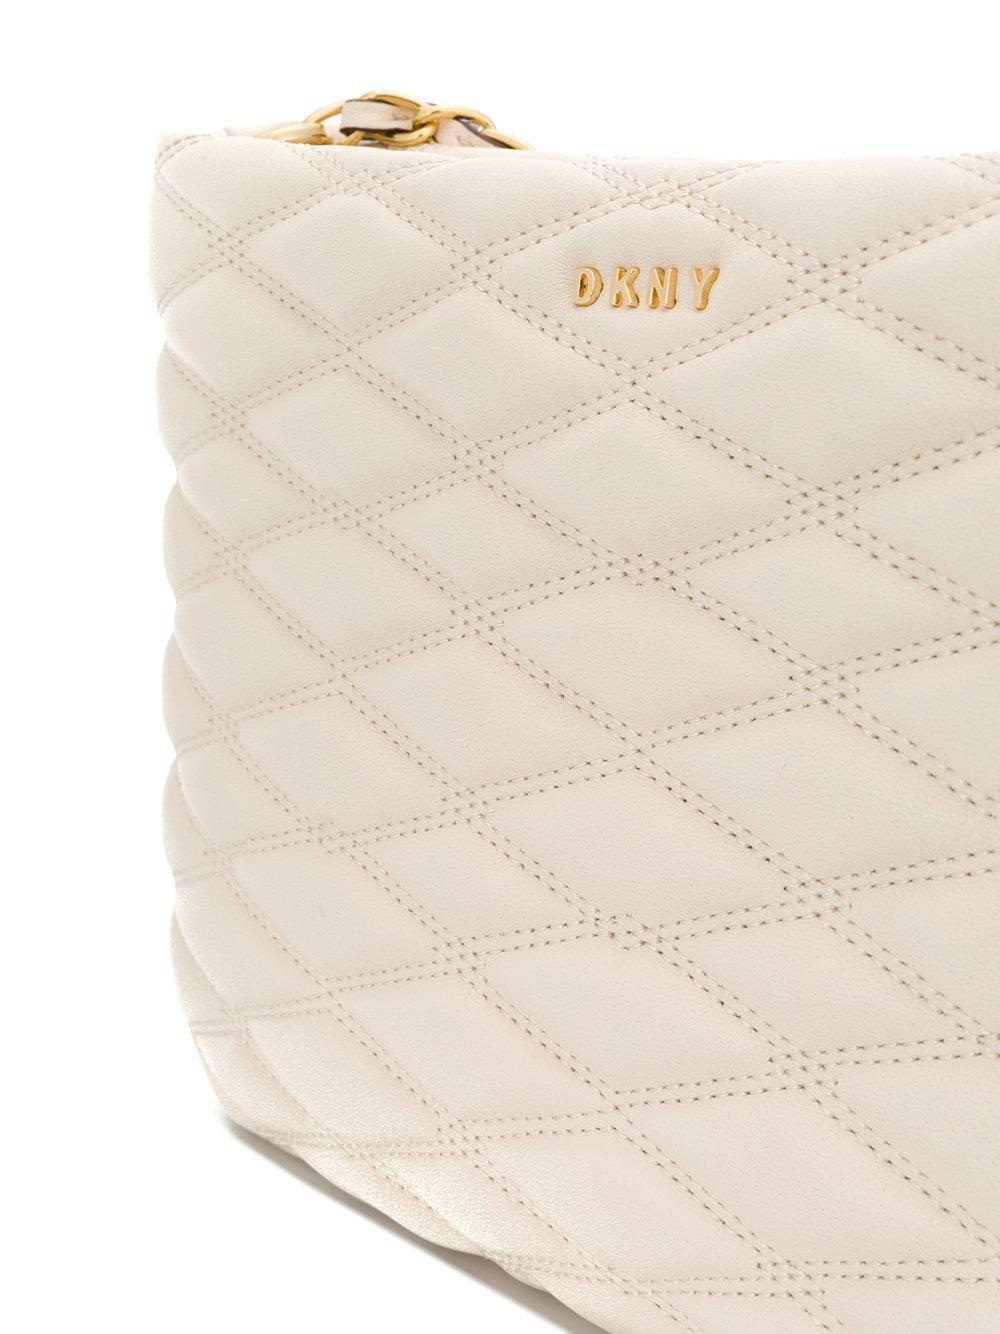 Donna Karan Lara Quilted Crossbody Bag in Natural